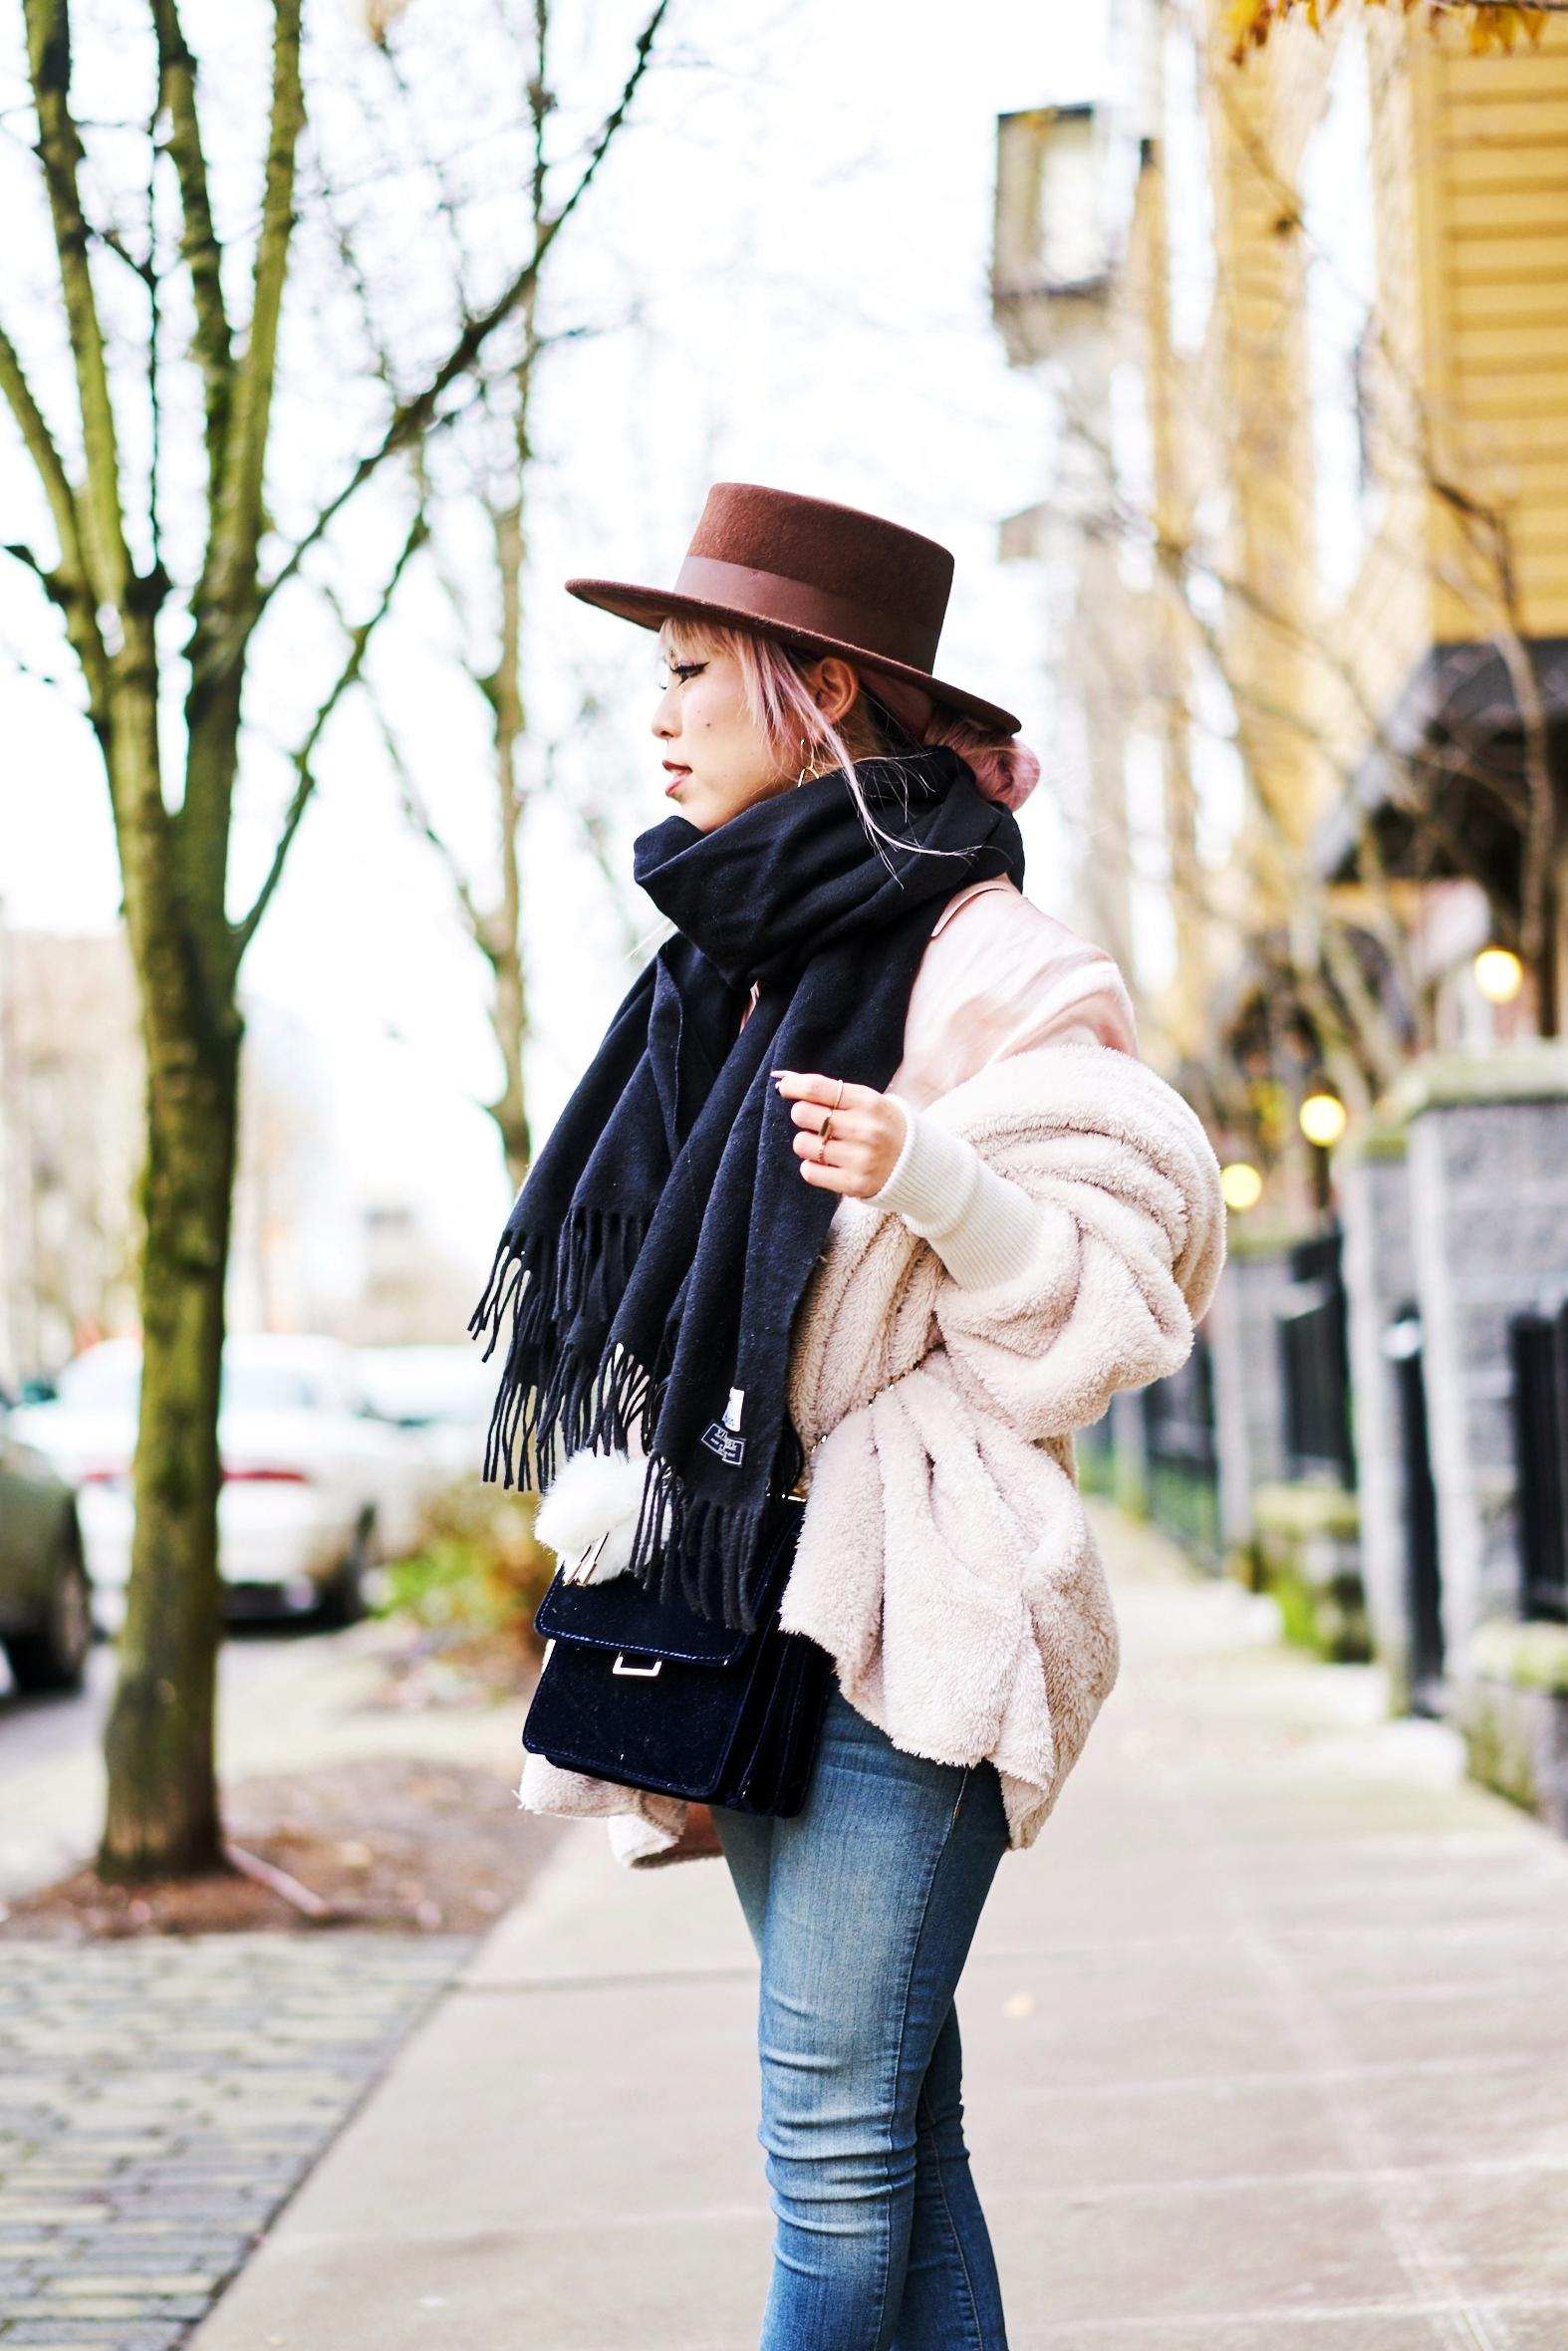 Zara blush satin shirt- She In Apricot Hooded Long Sleeve Loose Cardigan-Acne Studios Canada wool Scarf black-zara velvet crossbody bag-hudson jeans skinny jeans-lack of color the coco boater-Justfab KAIYA booties-Aika's love closet-Seattle fashion style blogger-japanese-pink hair